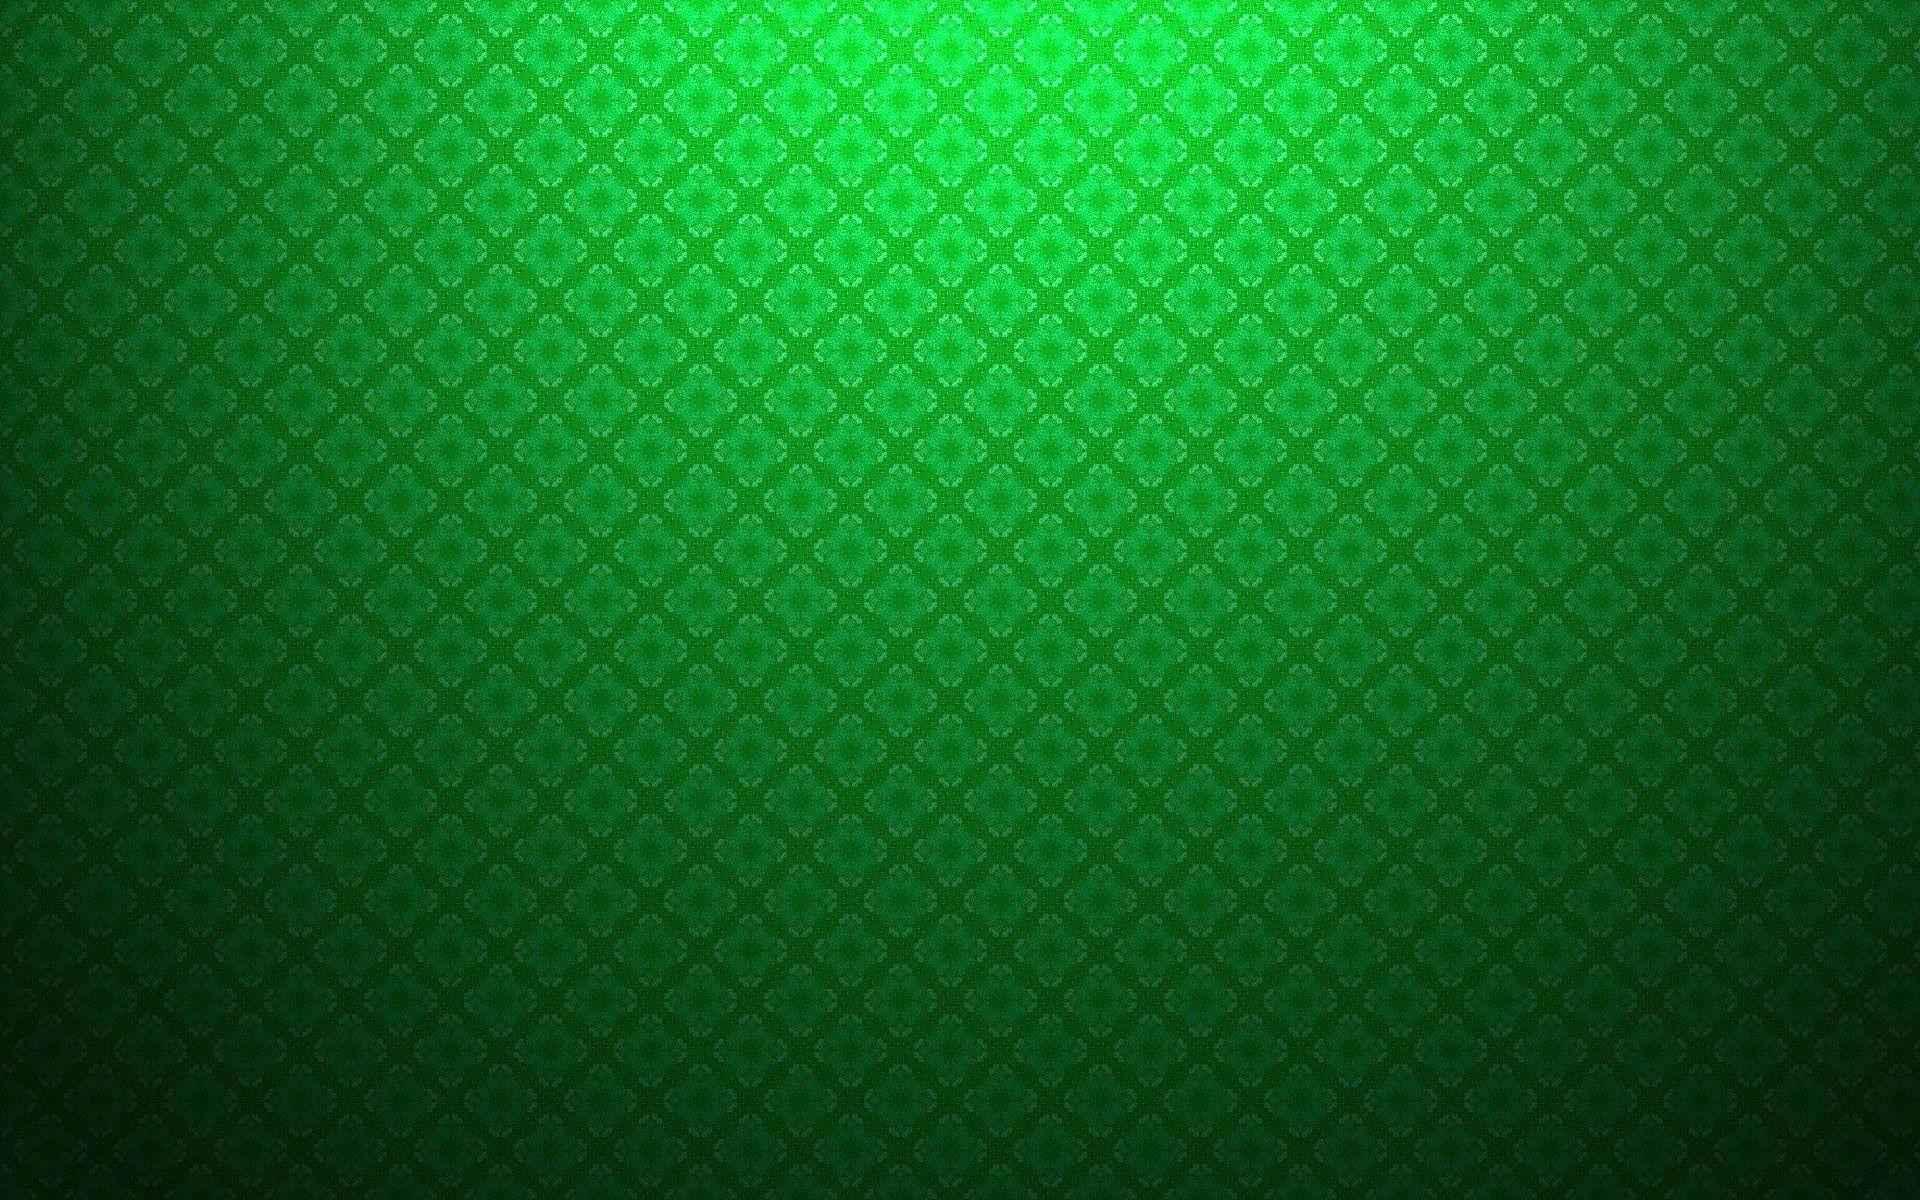 Green Textures Wallpaper 1920x1200 Green Textures Backgrounds 1920x1200